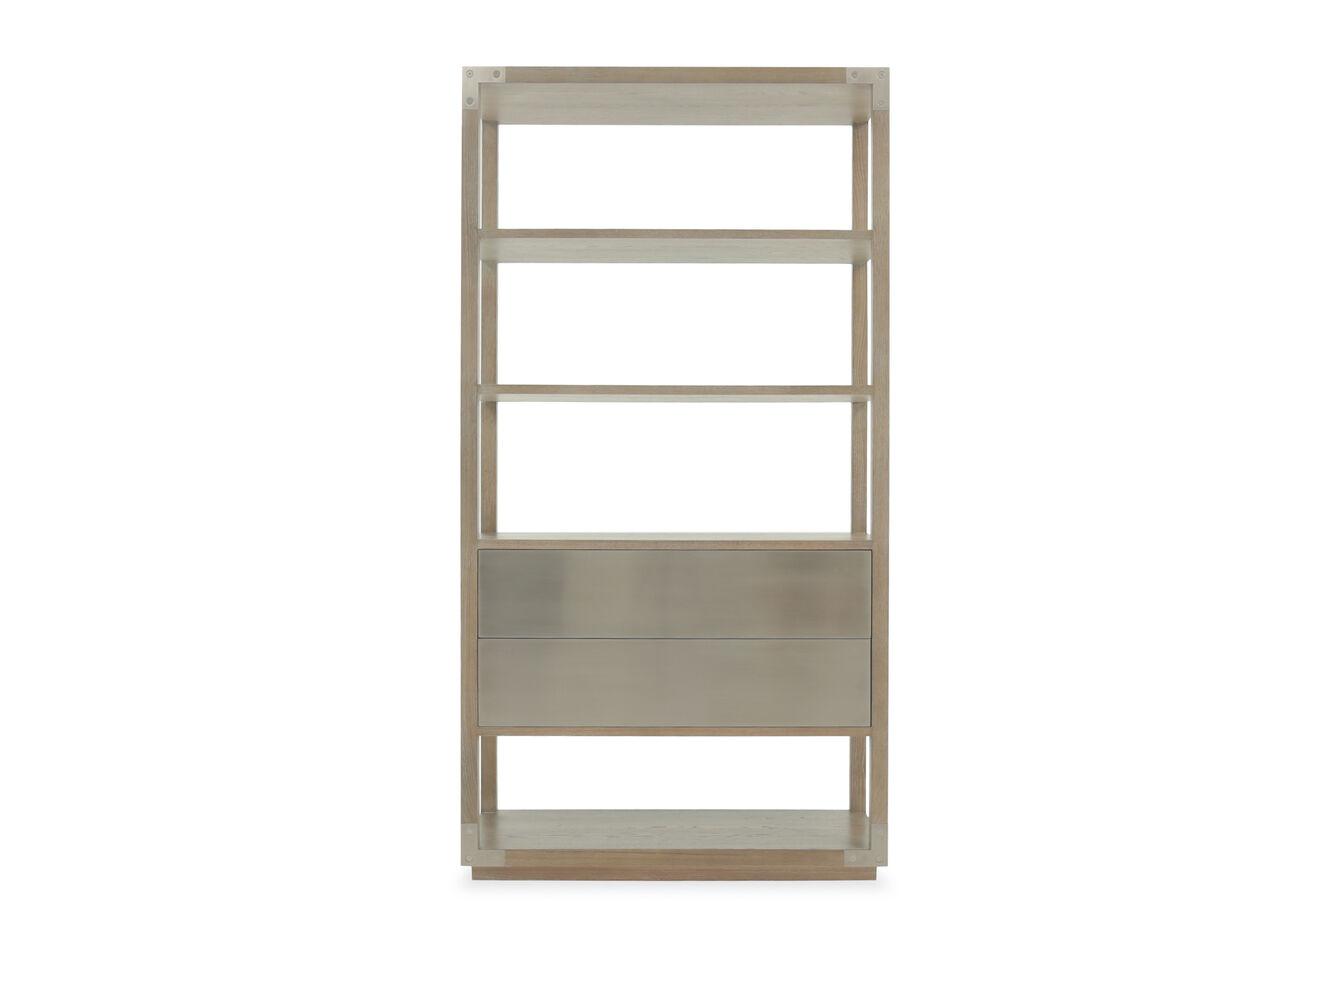 five shelf modern etagere in rustic sand mathis brothers. Black Bedroom Furniture Sets. Home Design Ideas